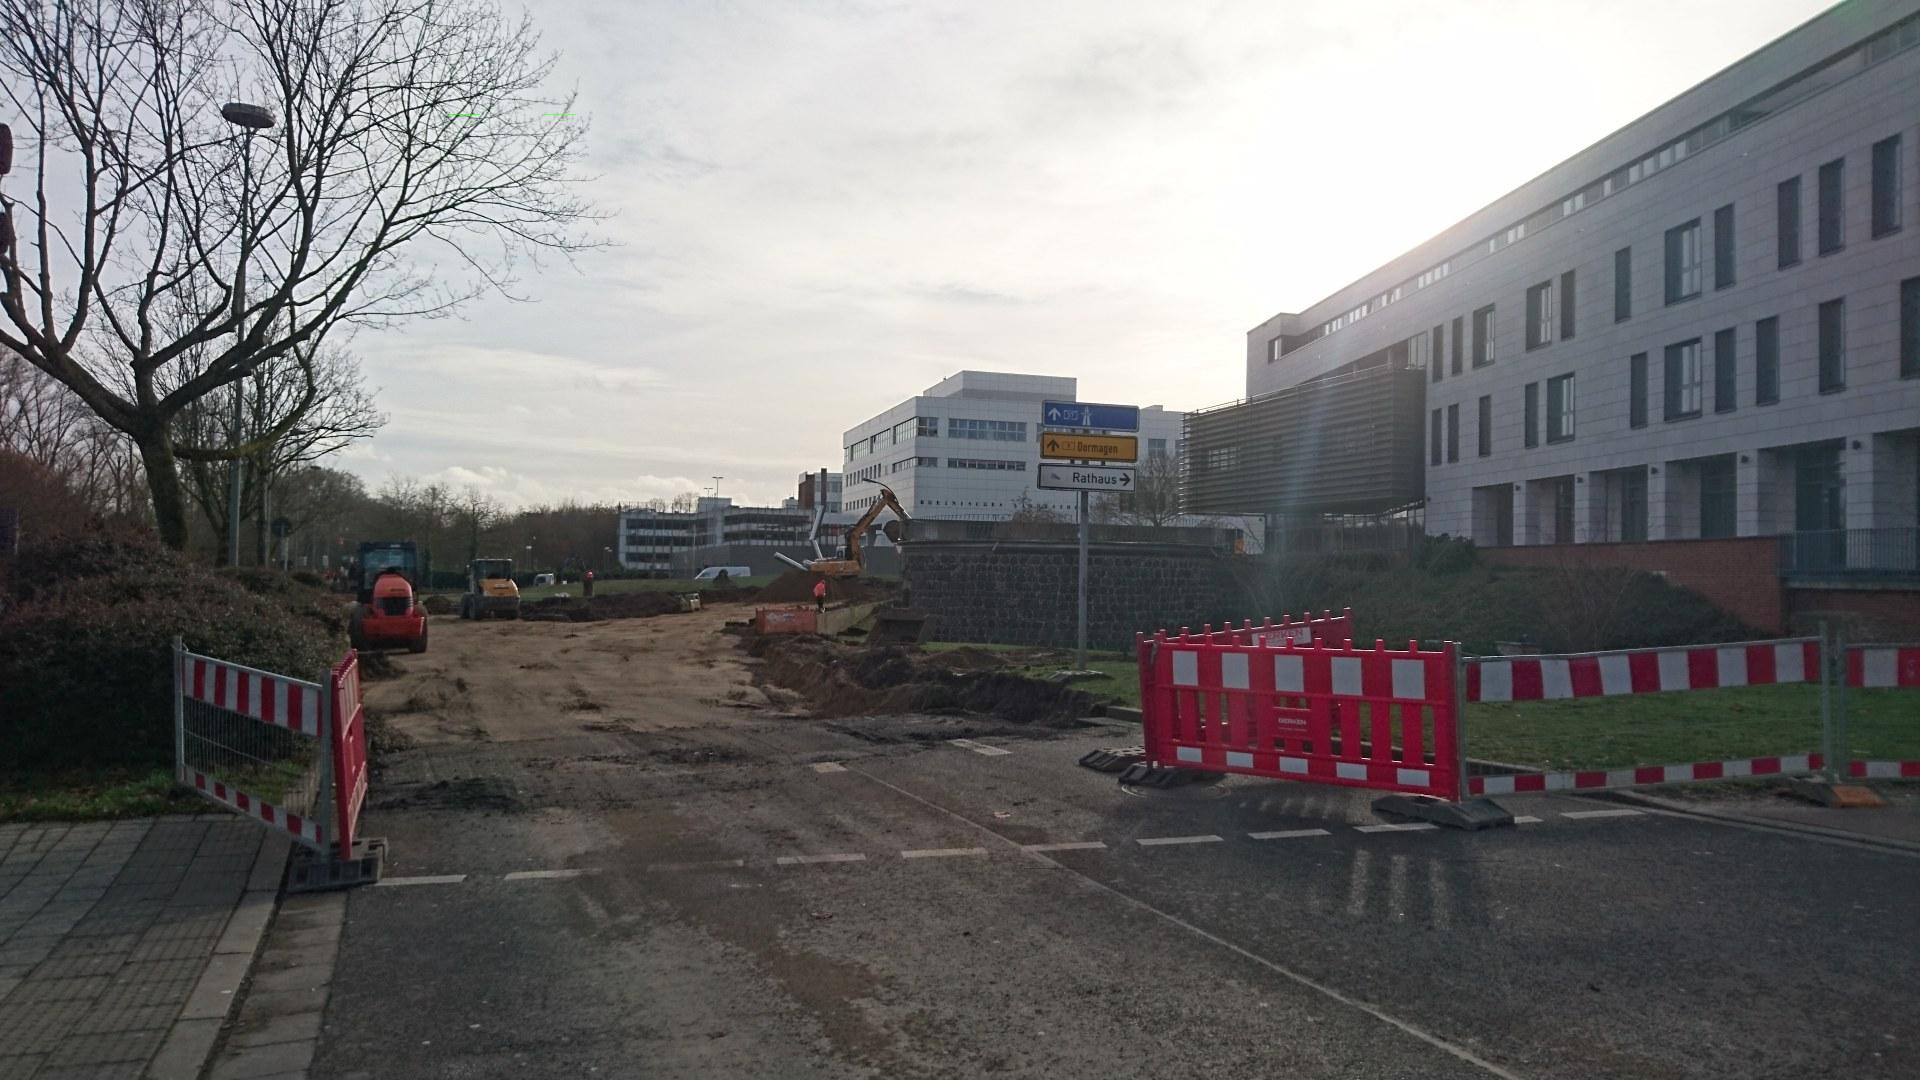 Baustelle Hessentor